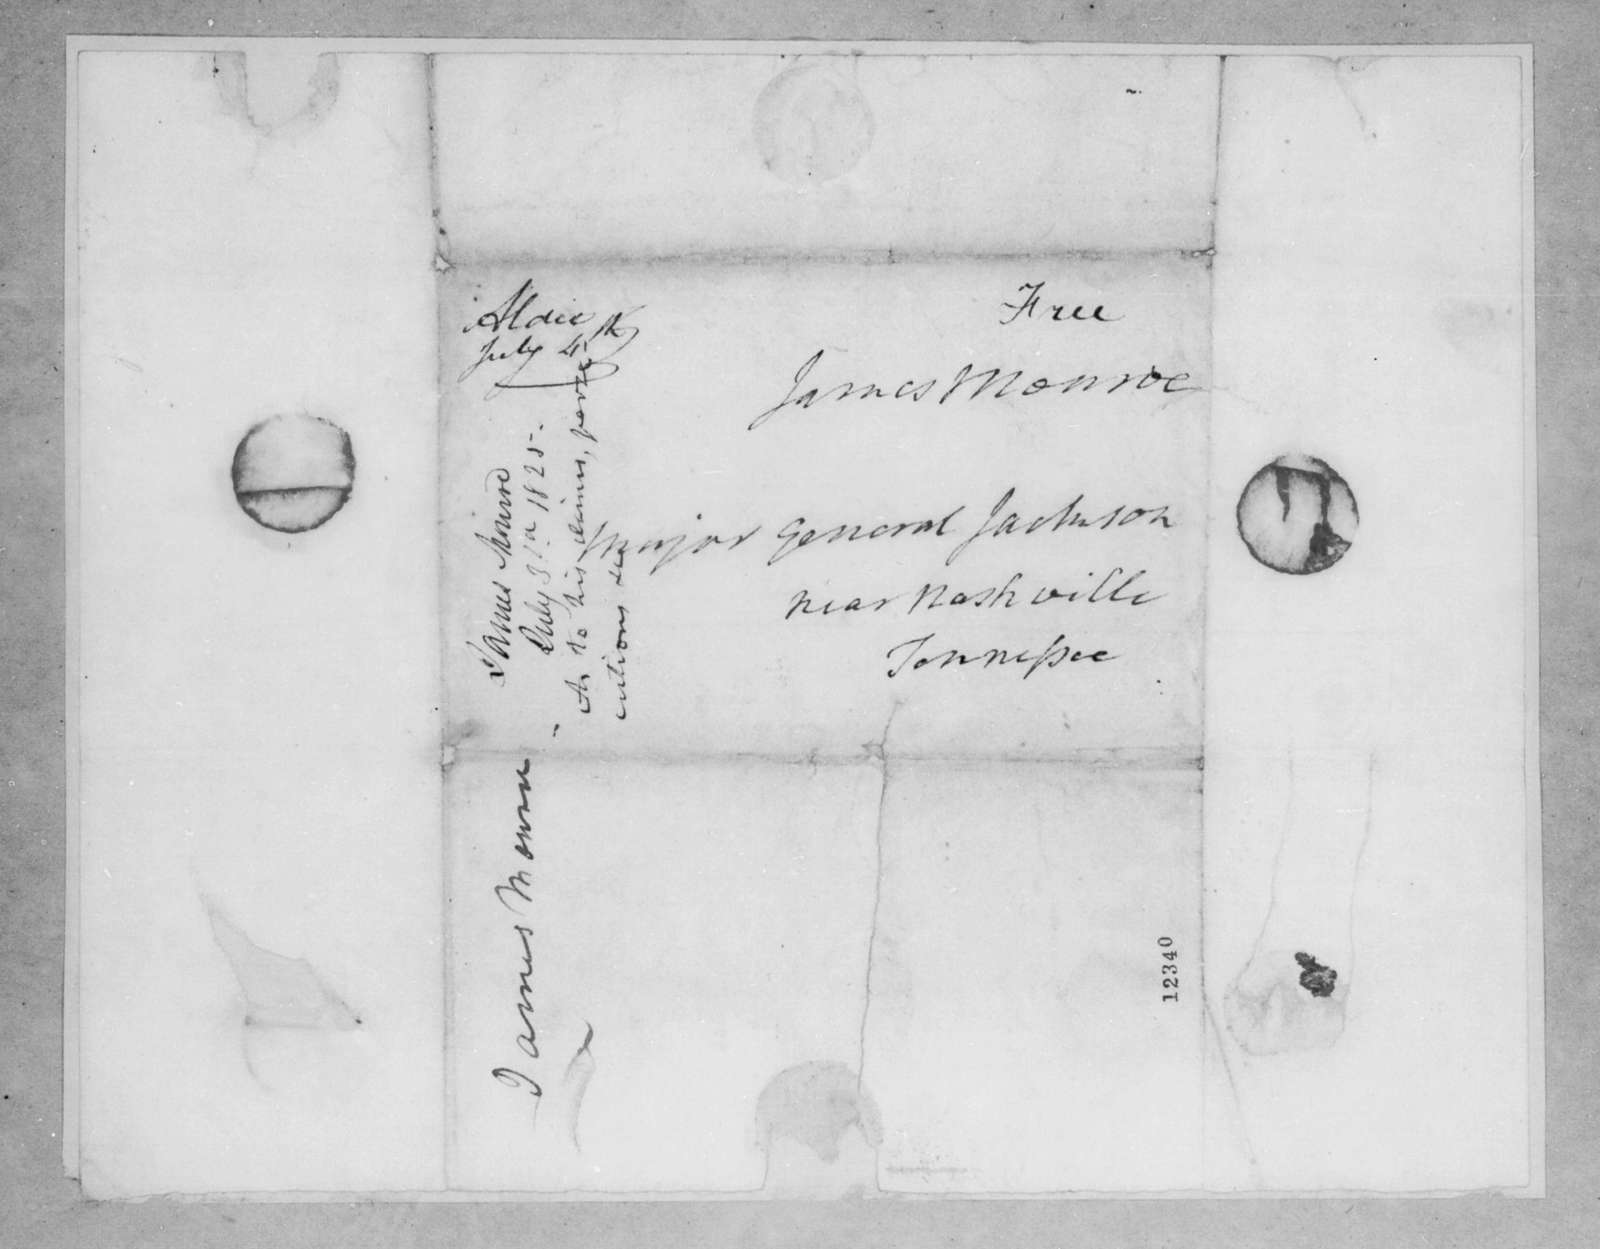 James Monroe to Andrew Jackson, July 31, 1825